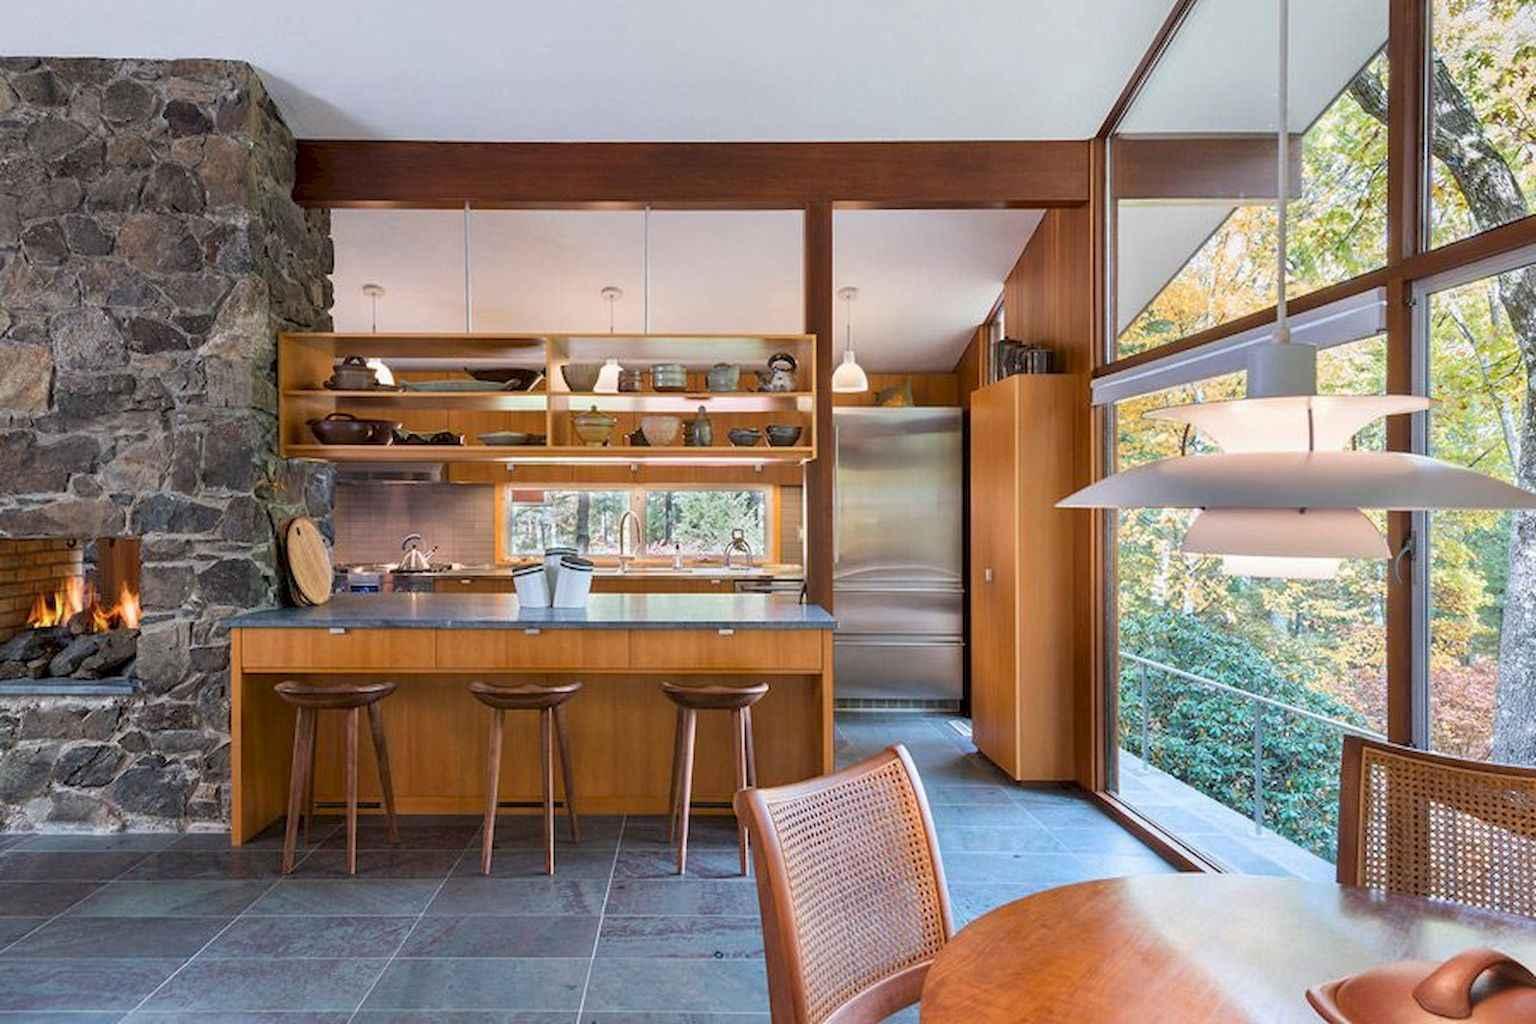 Mid century modern kitchen design ideas (21)